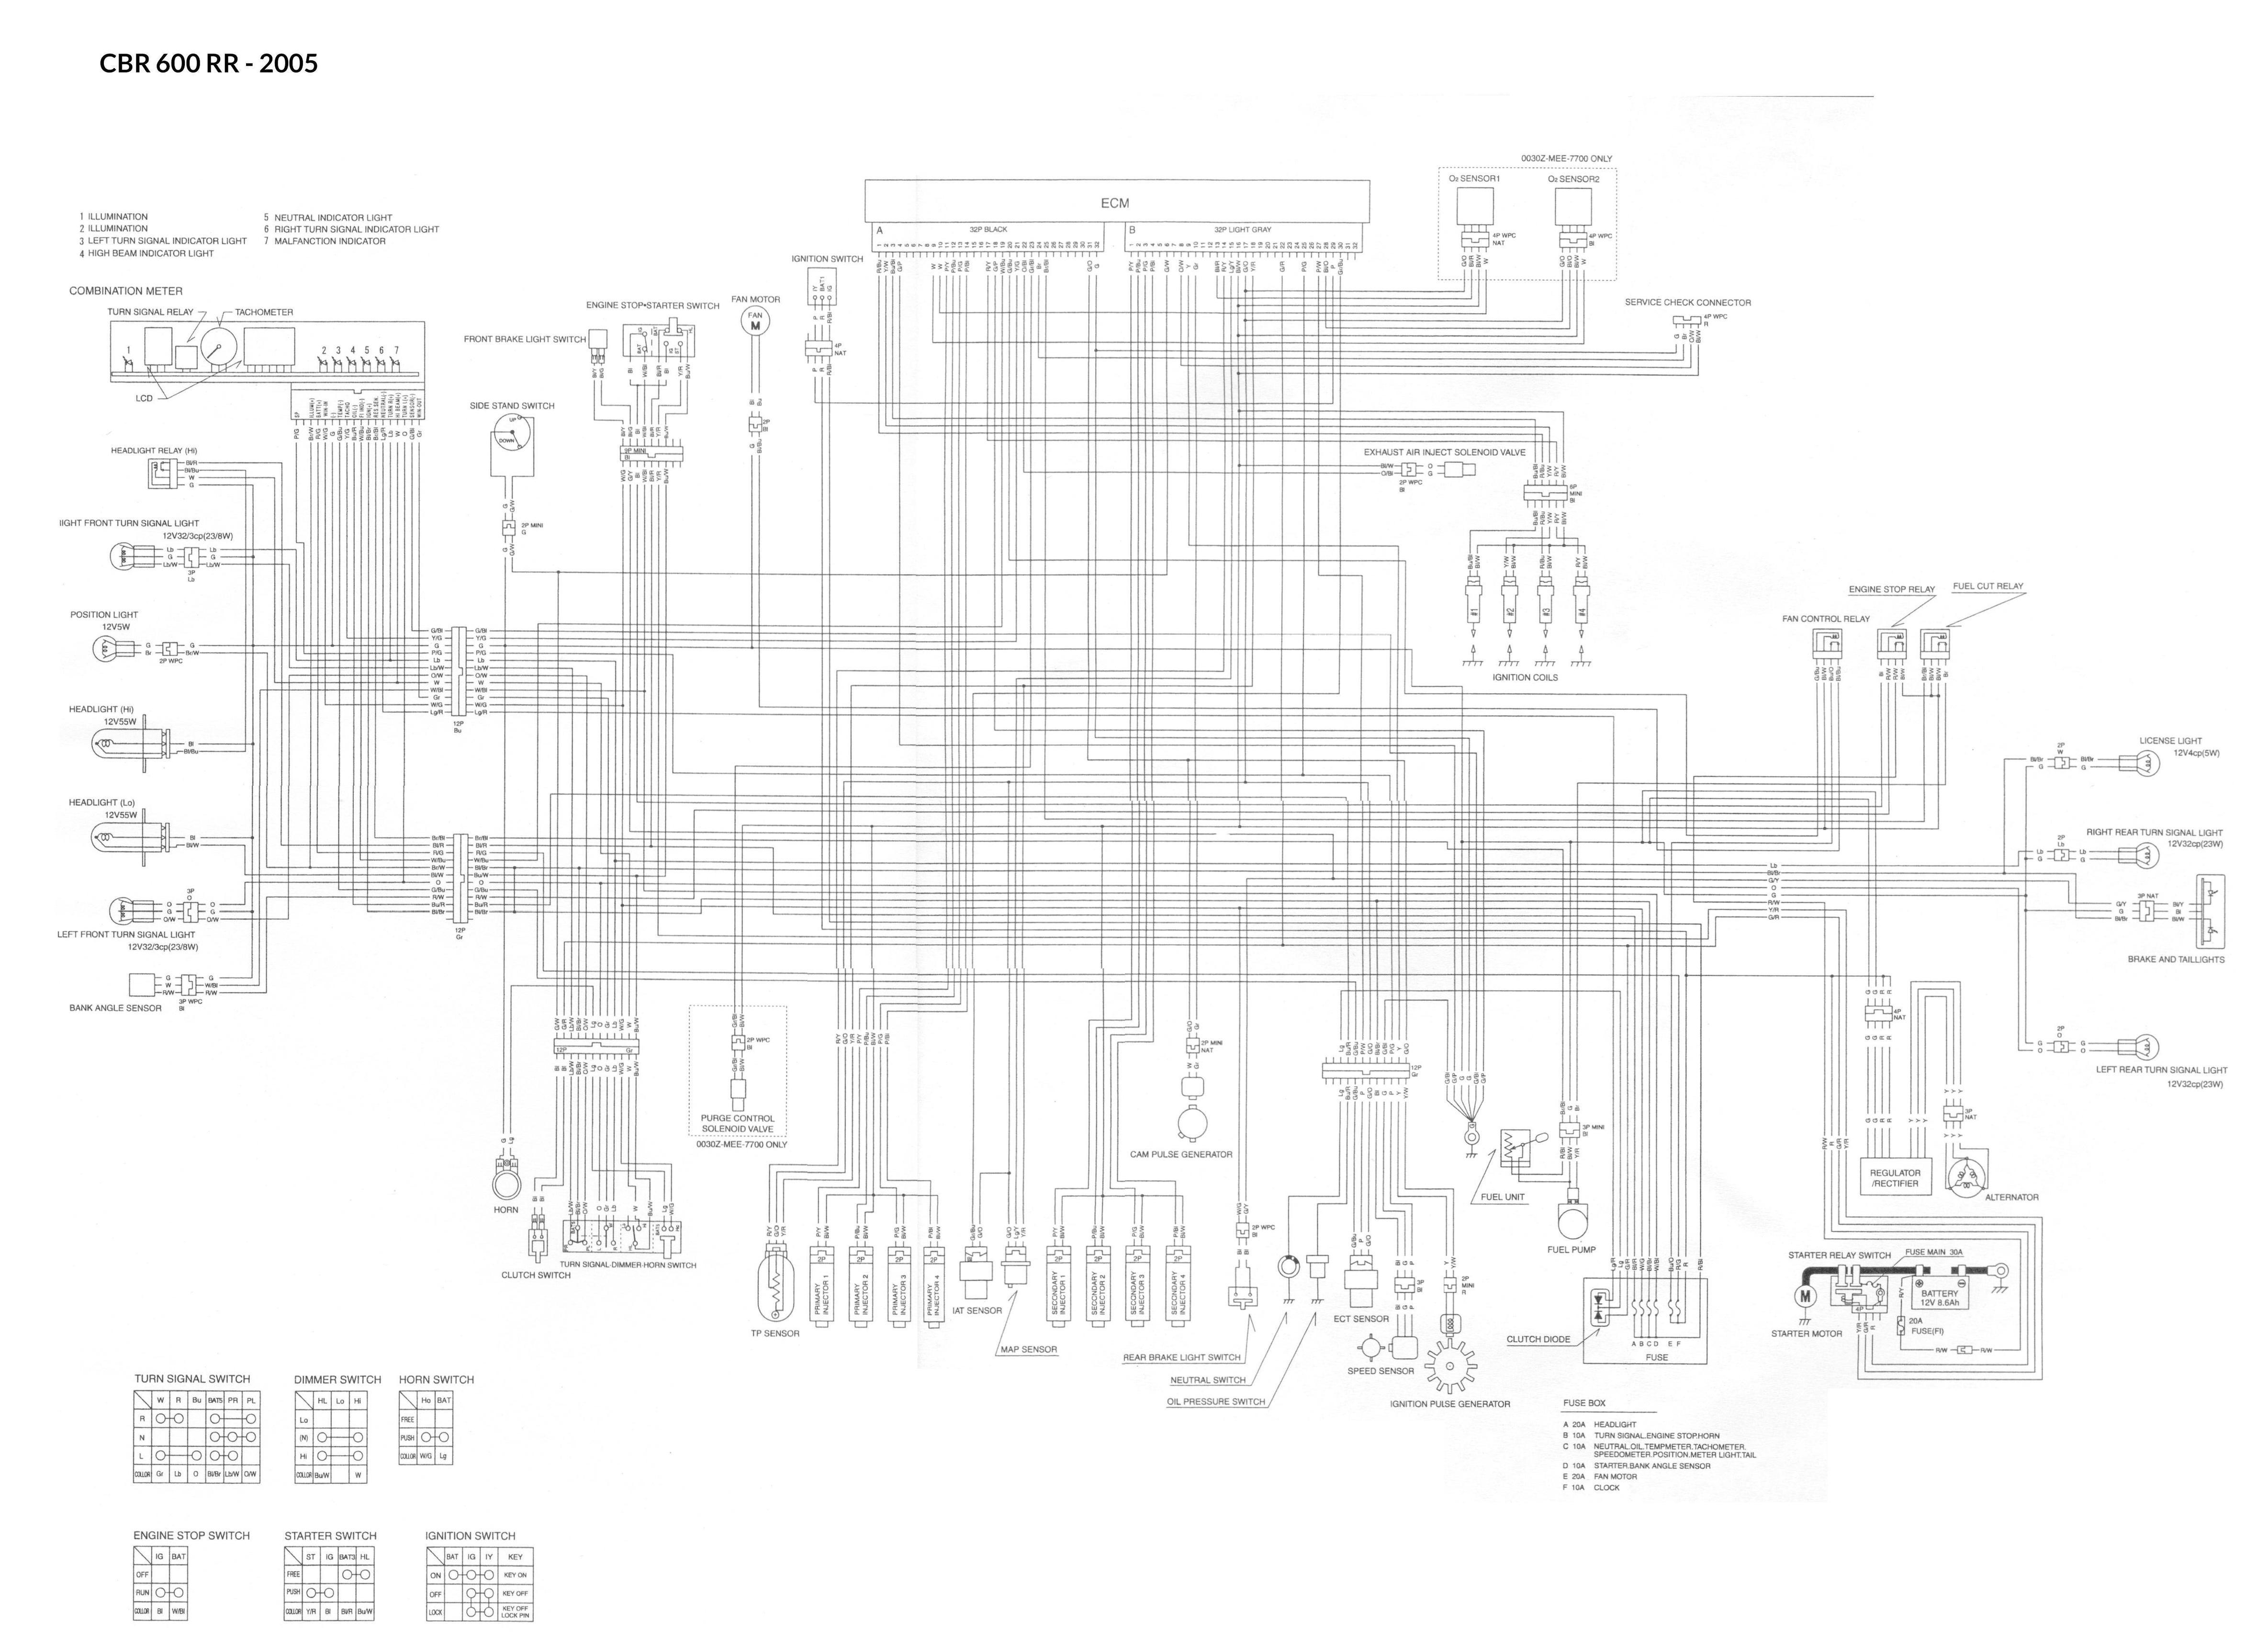 Wiring Schematic Diagram For A Cbr600rr